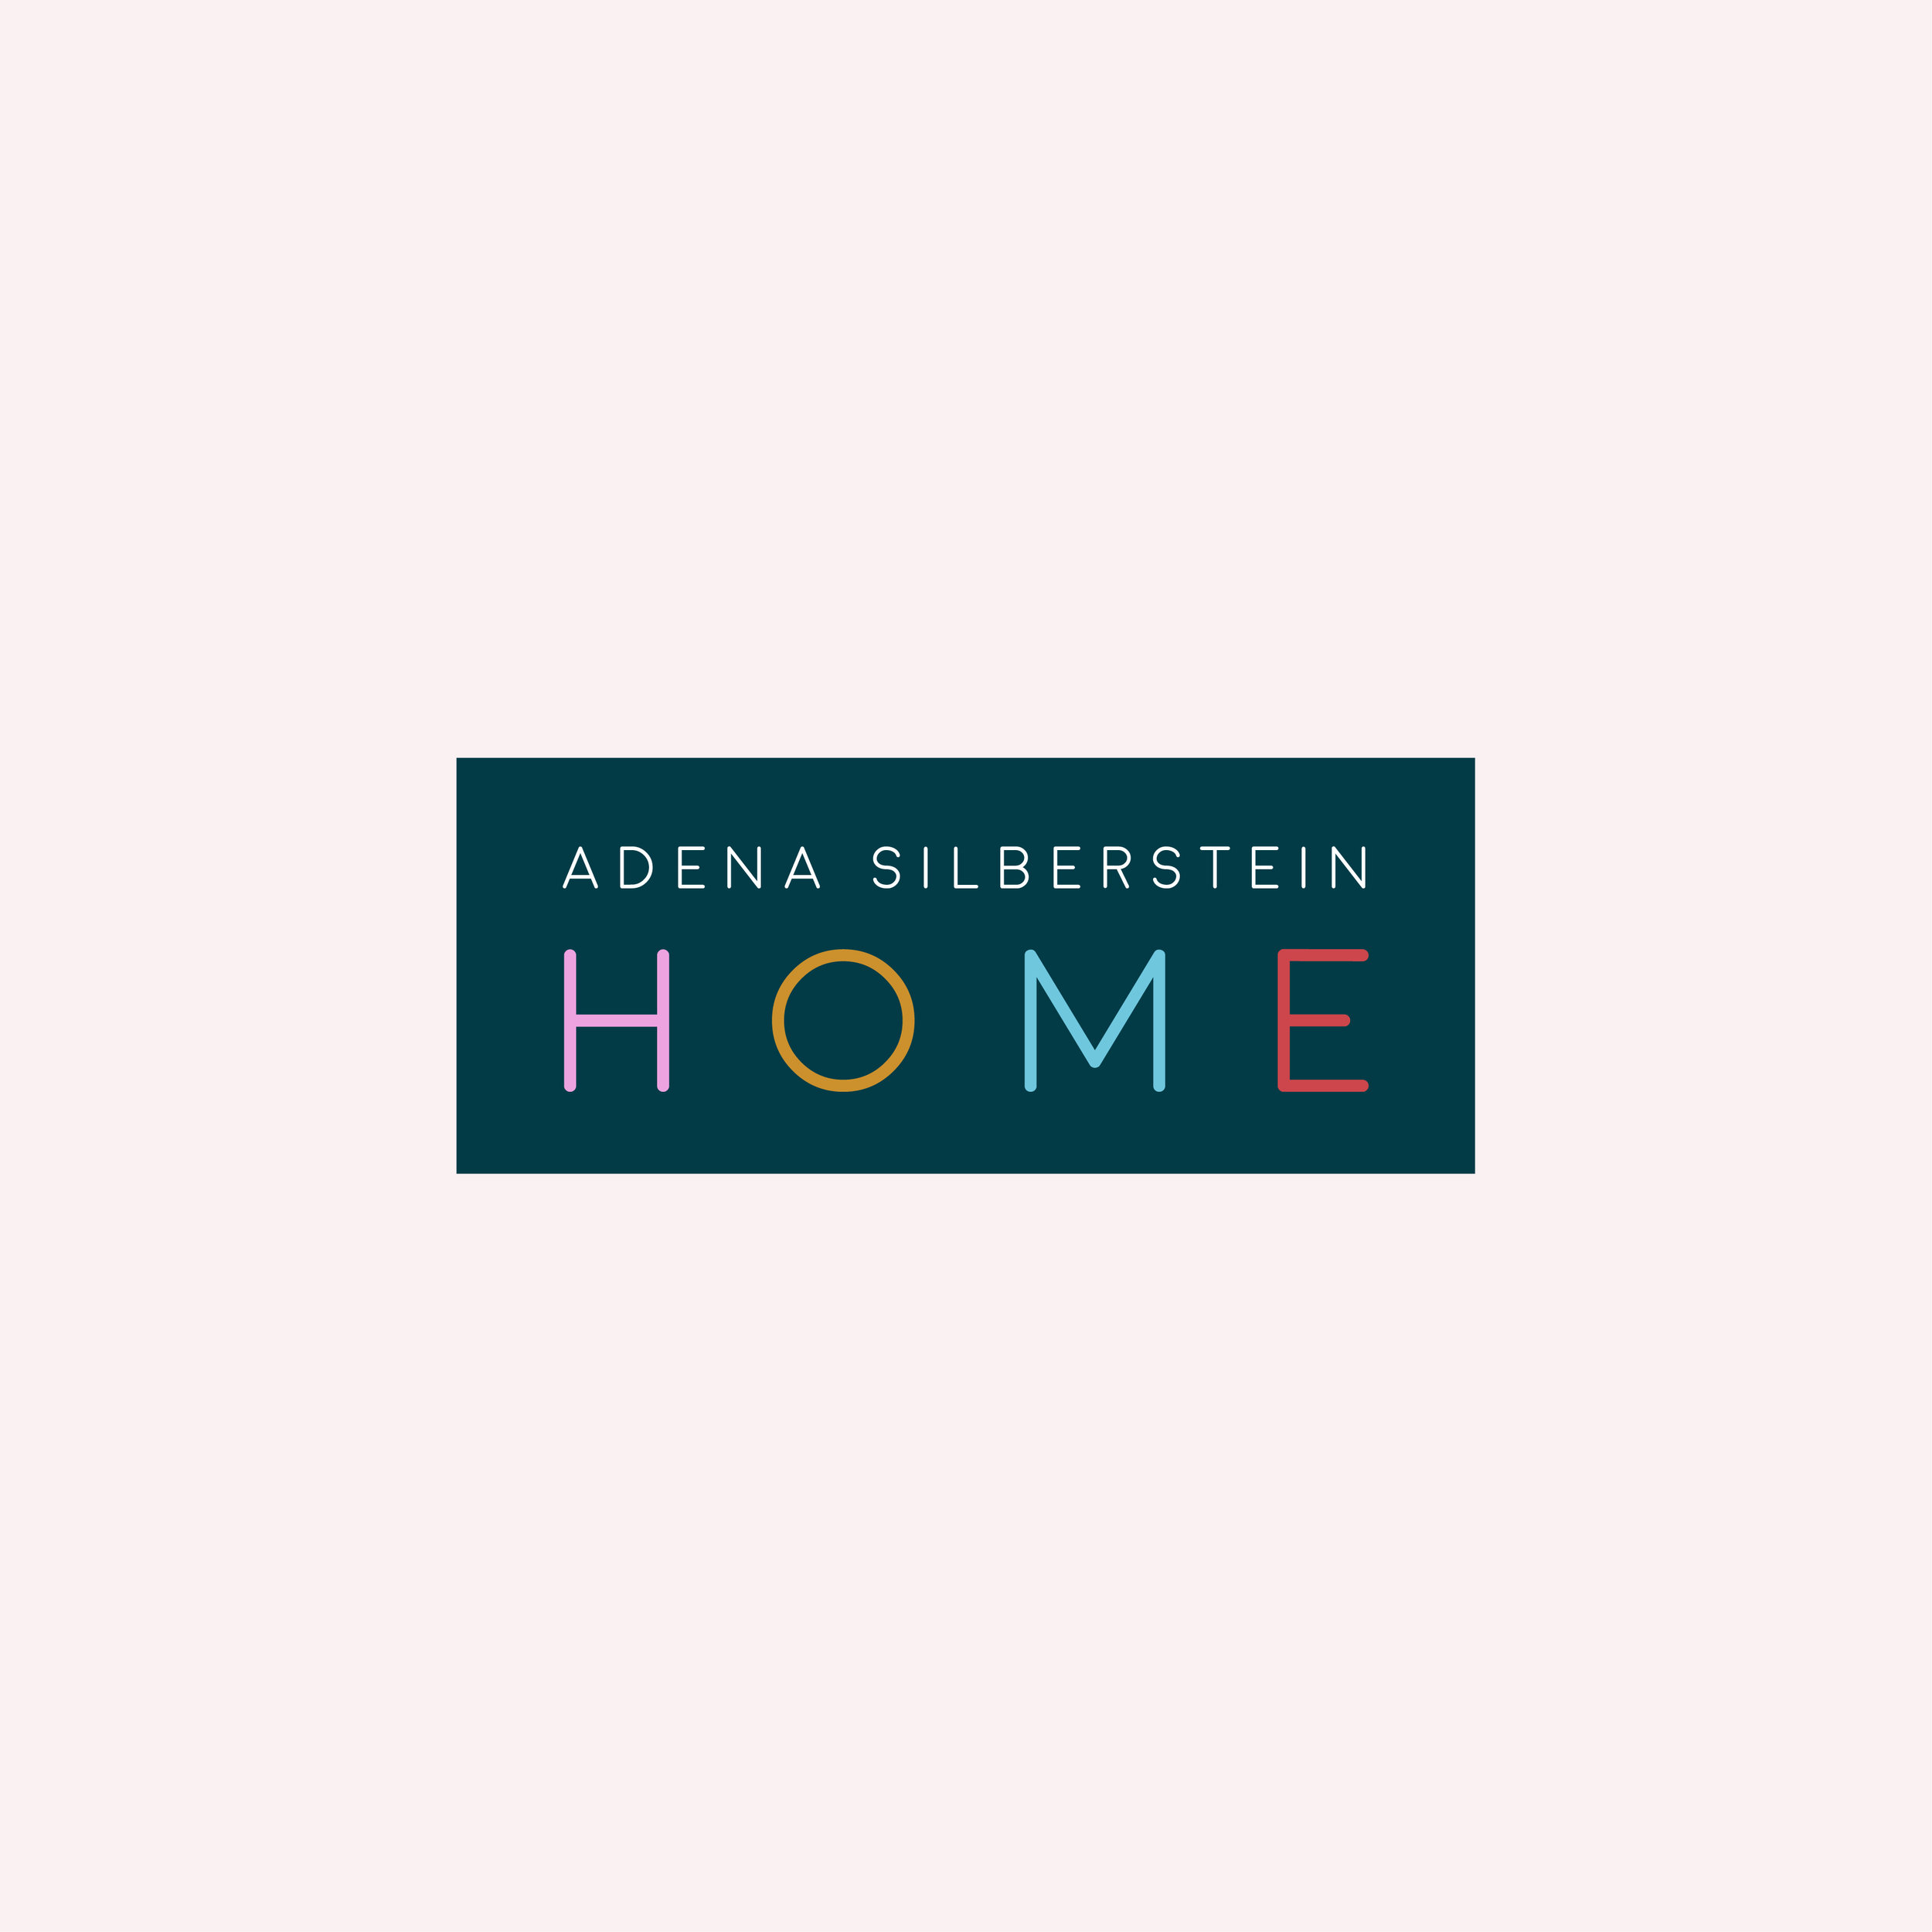 Adena Silb Home_logo-01.jpg